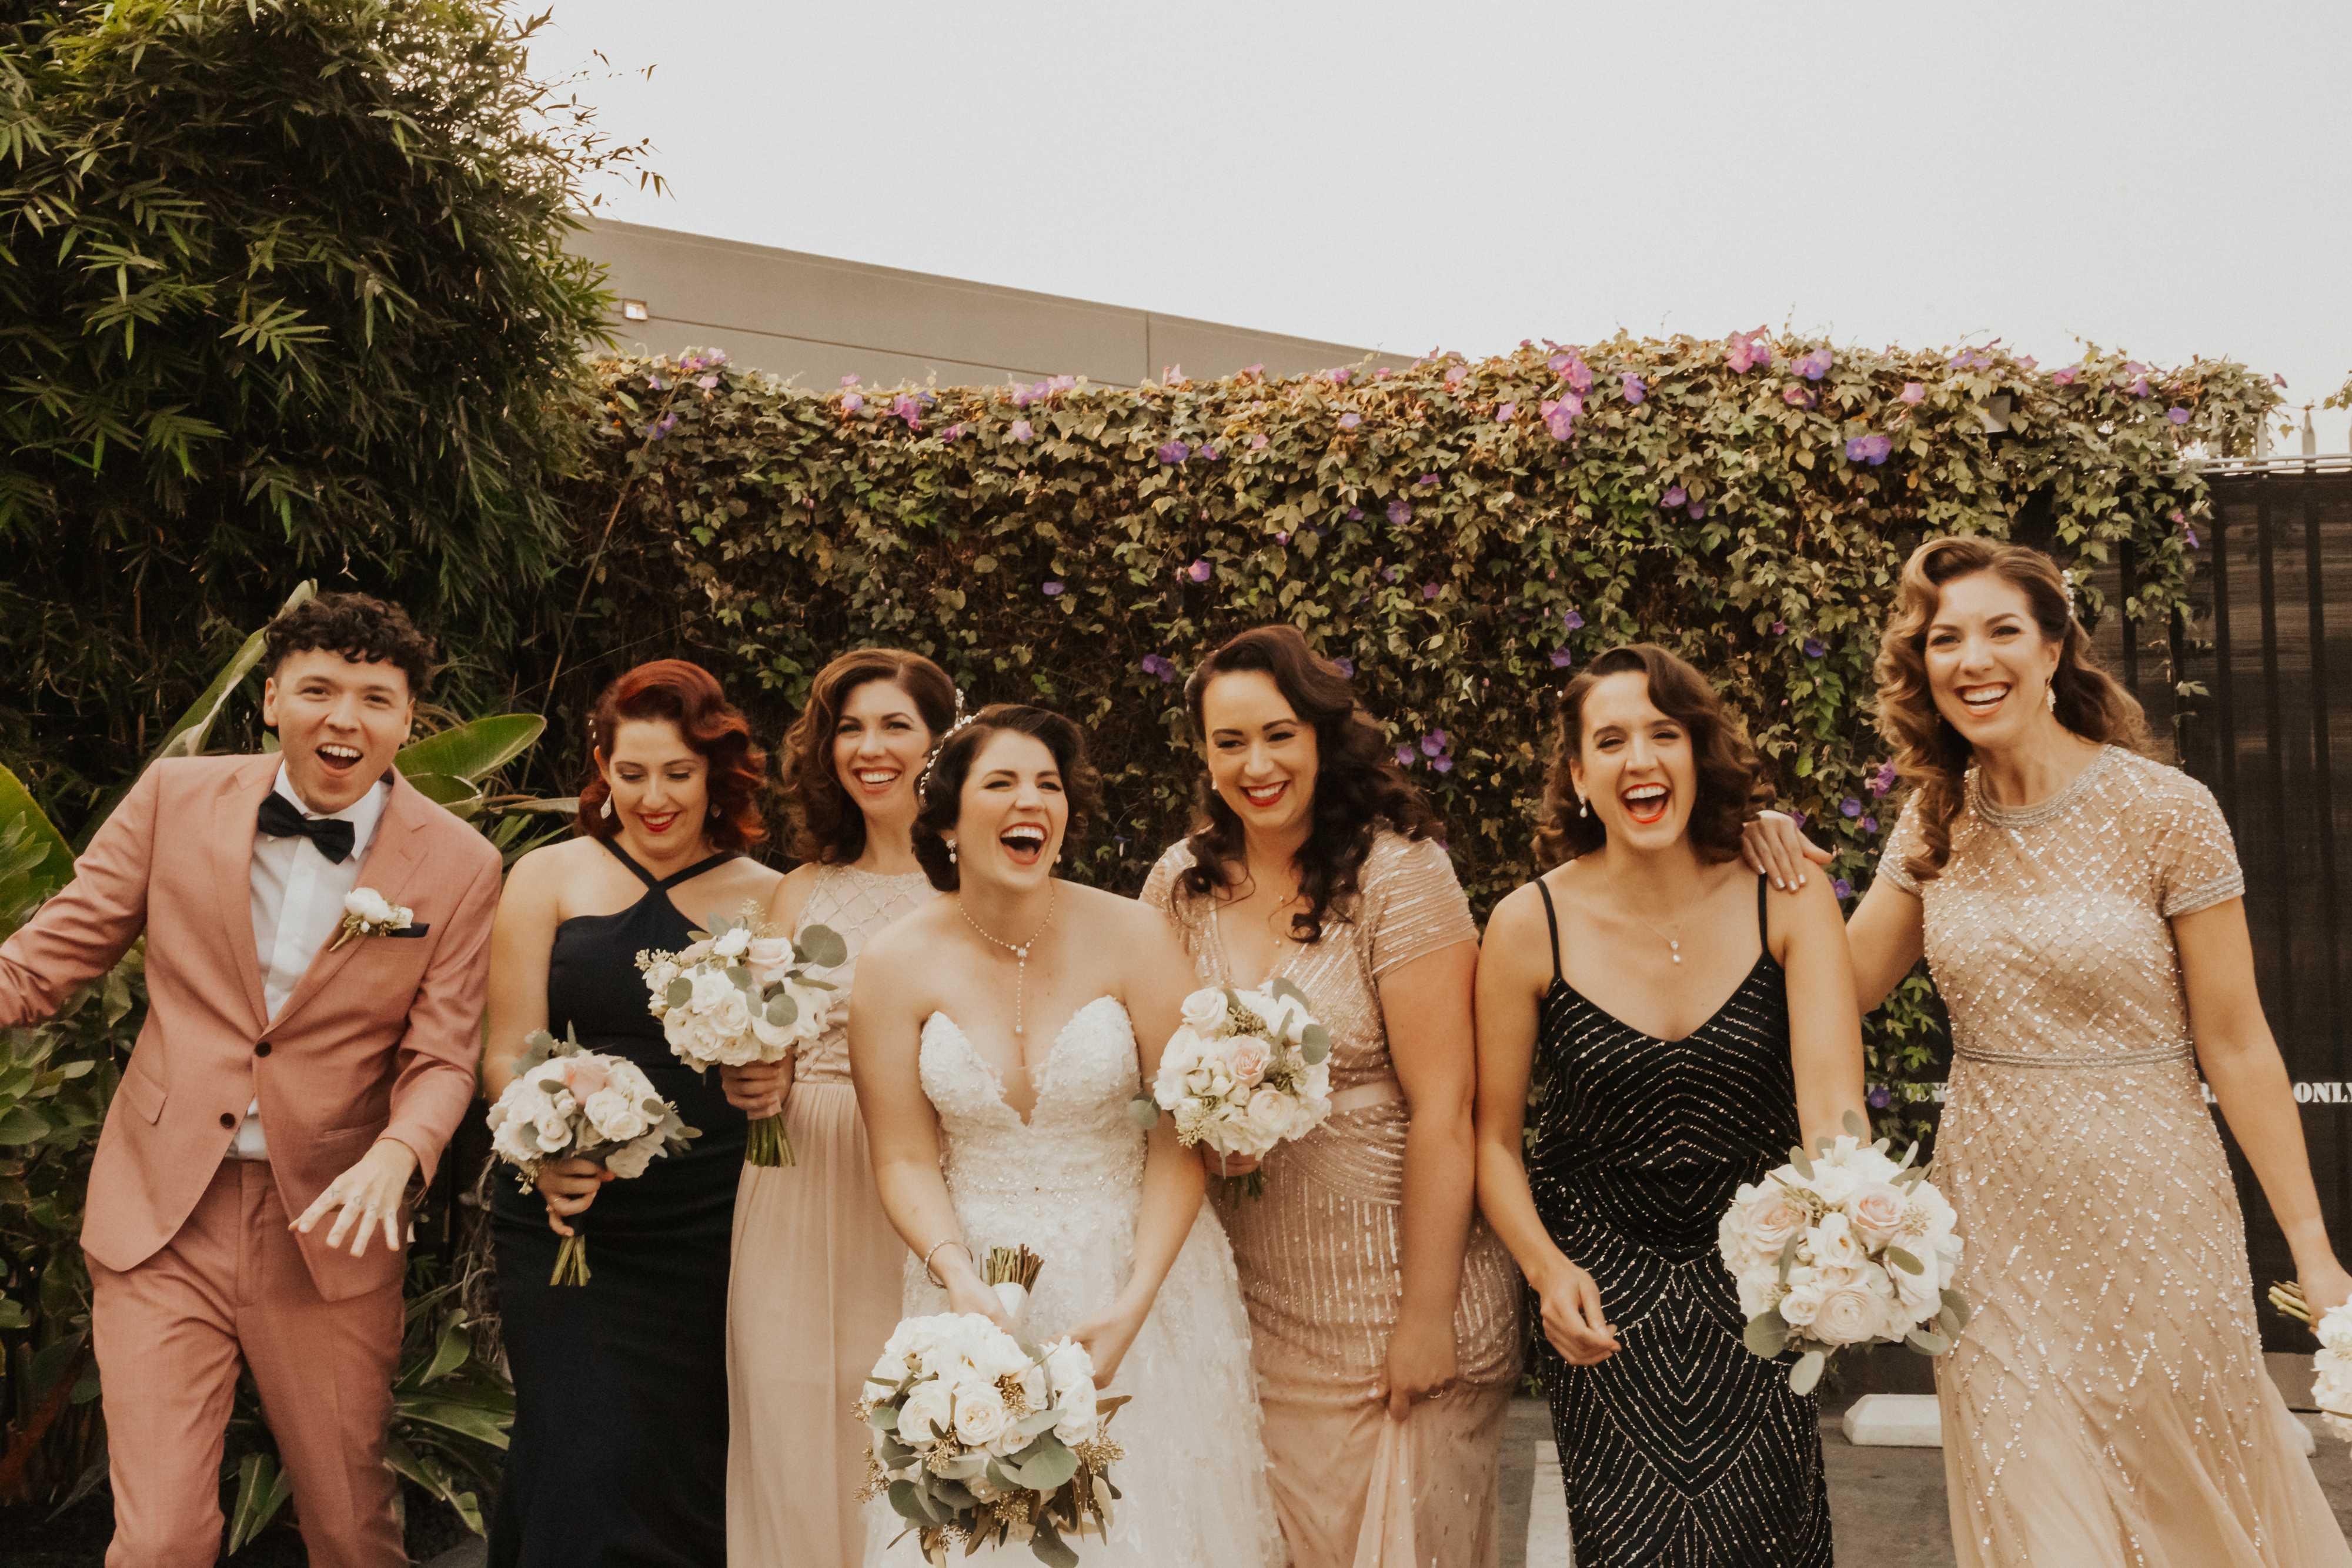 Millwick wedding, DTLA, LA, CA